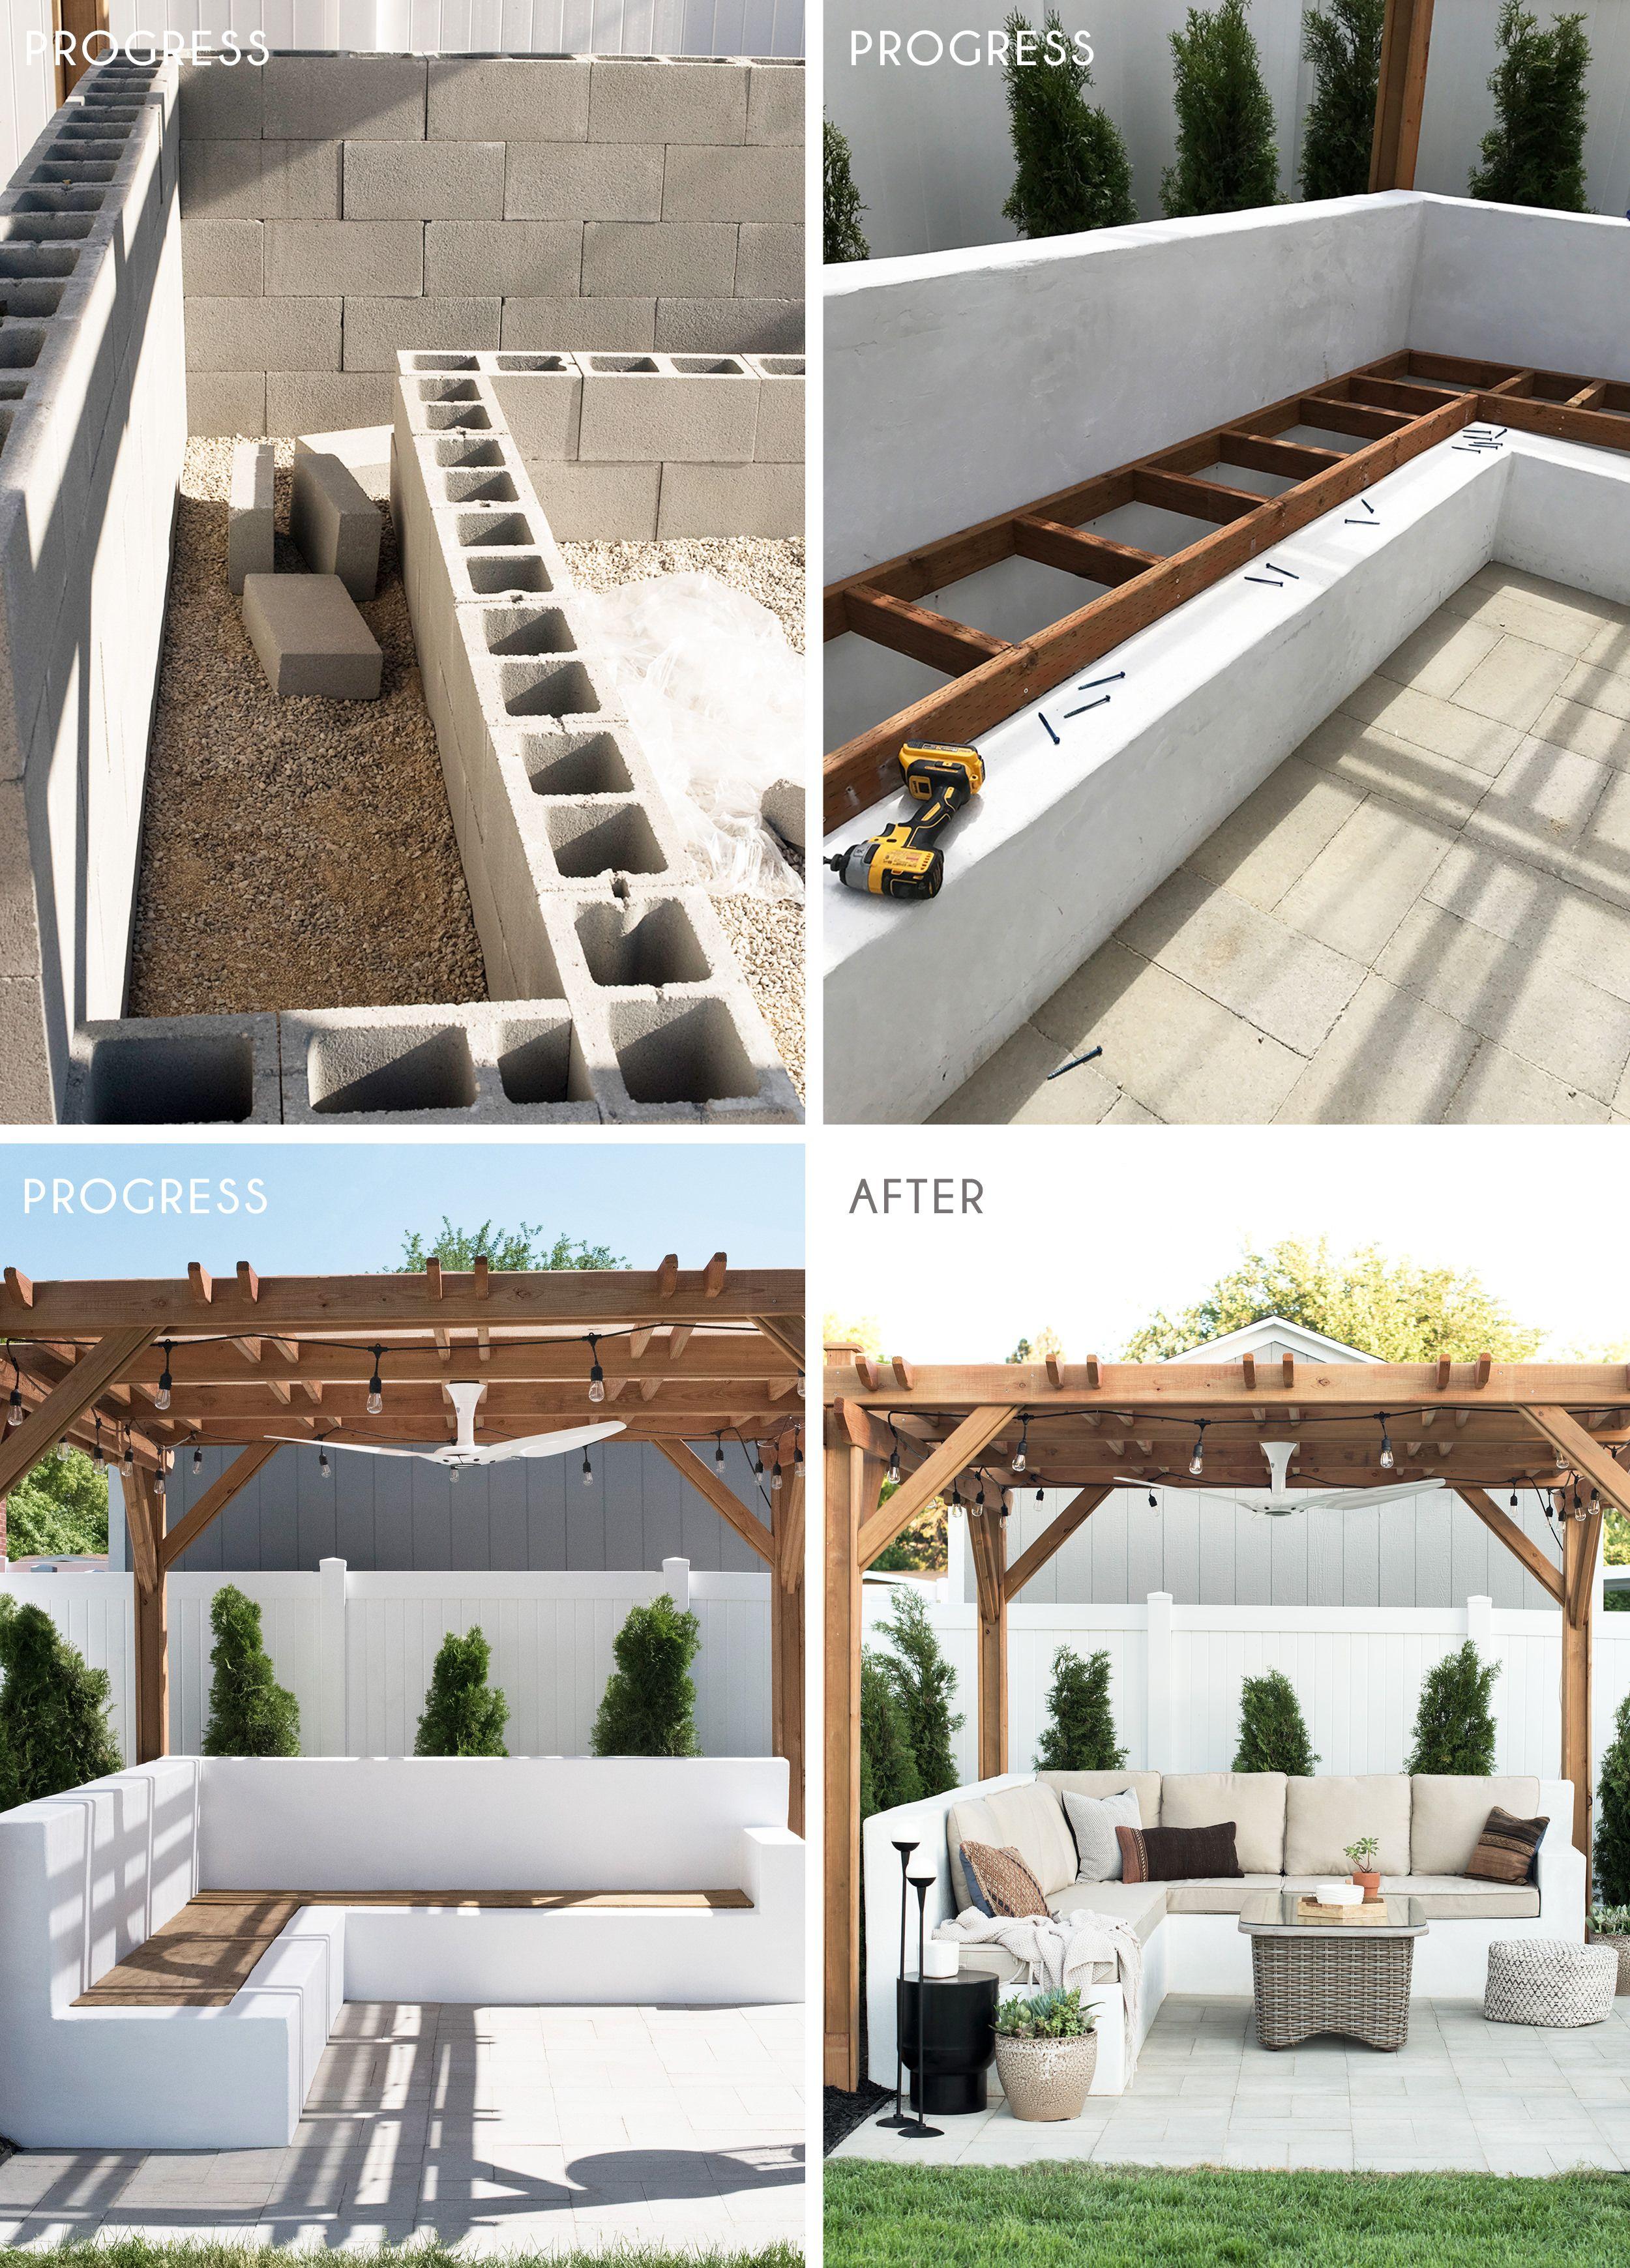 10 Doable Diy Ideas To Transform Your Backyard Hardscape Backyard Backyard Backyard Patio Designs